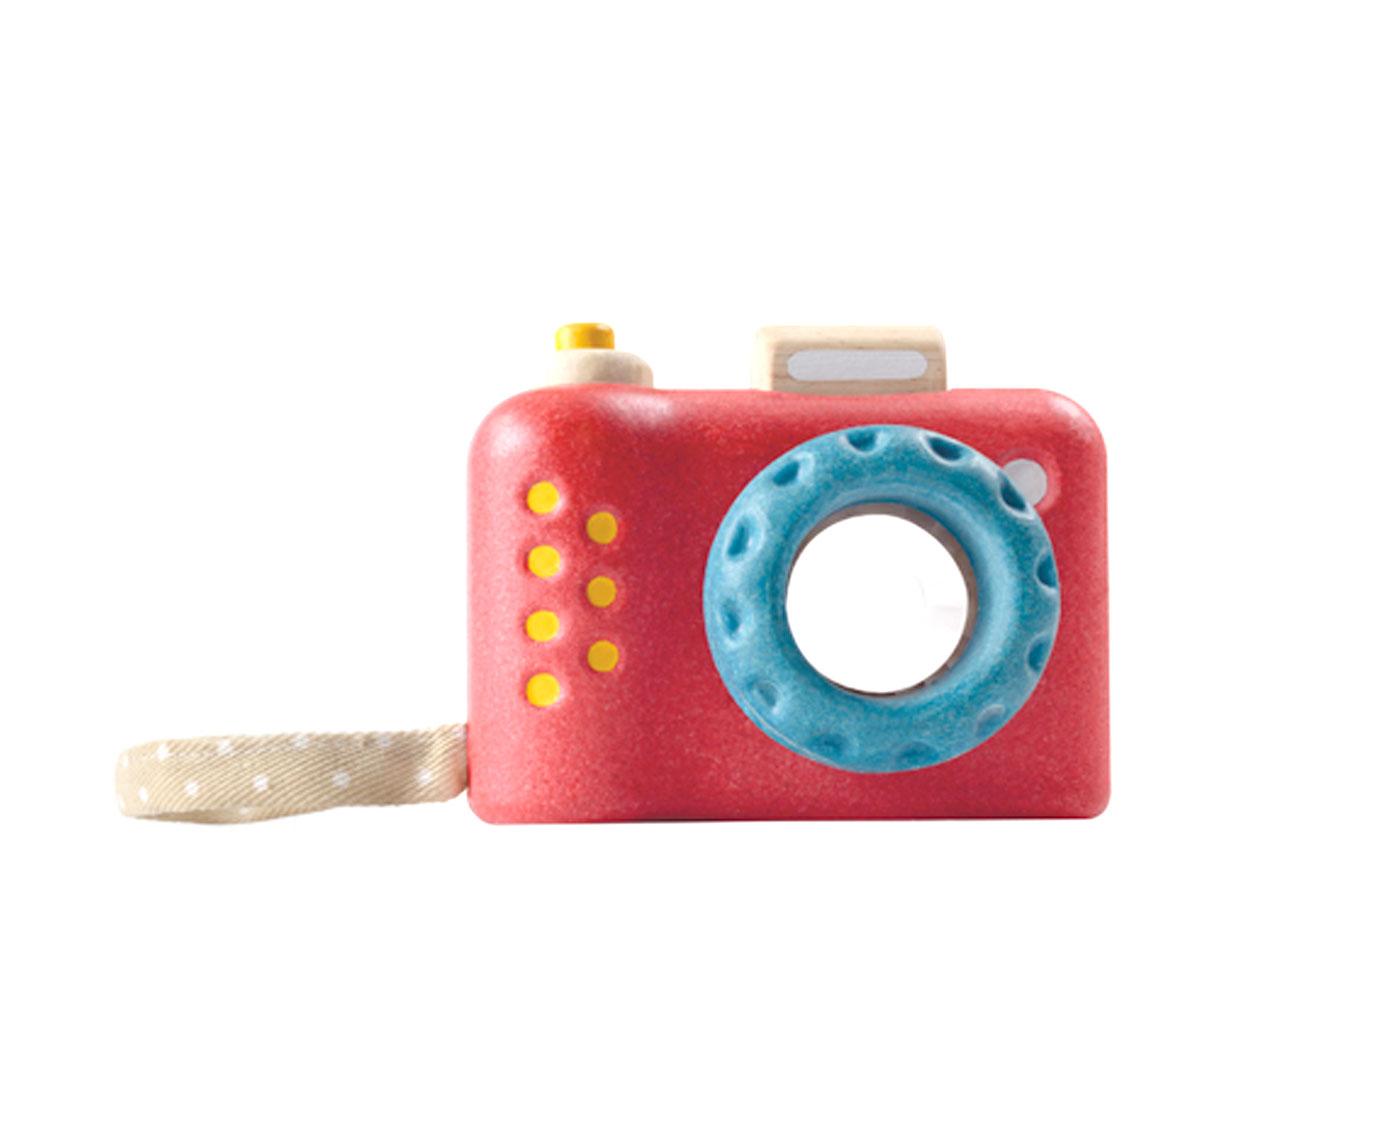 Plan Toys 'My first camera'